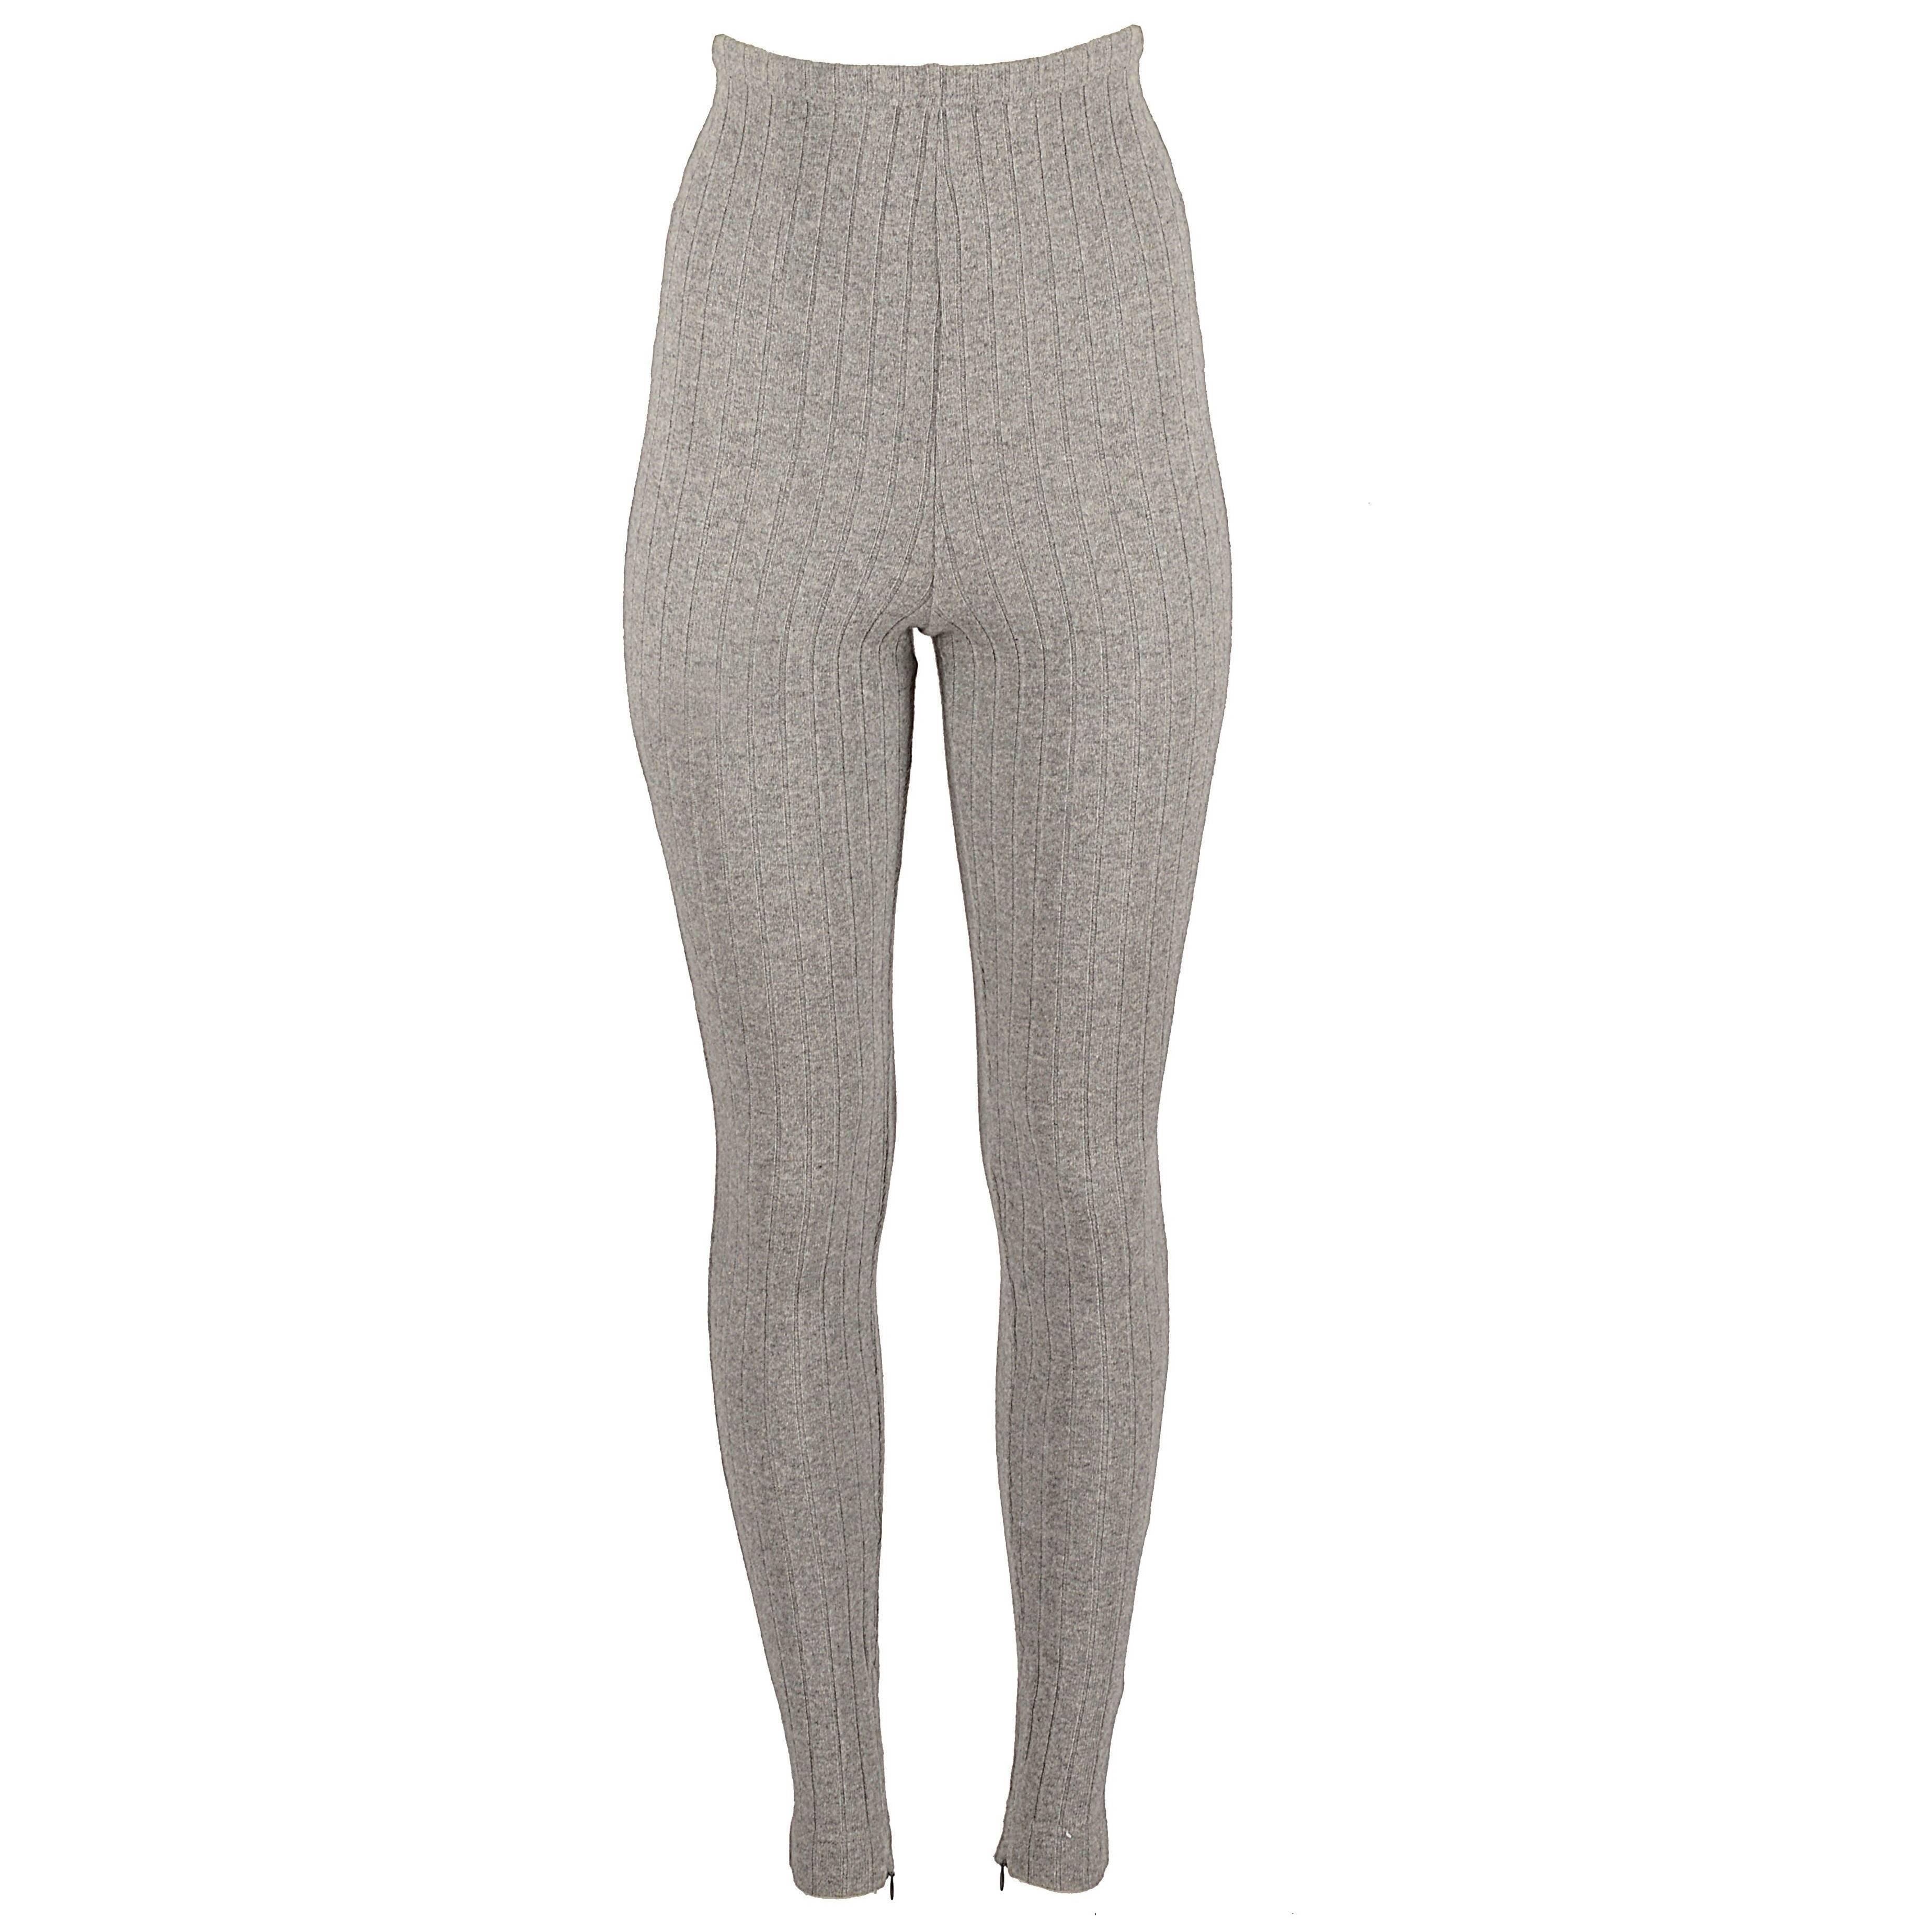 Dolce & Gabbana grey wool ribbed knit high waisted leggings